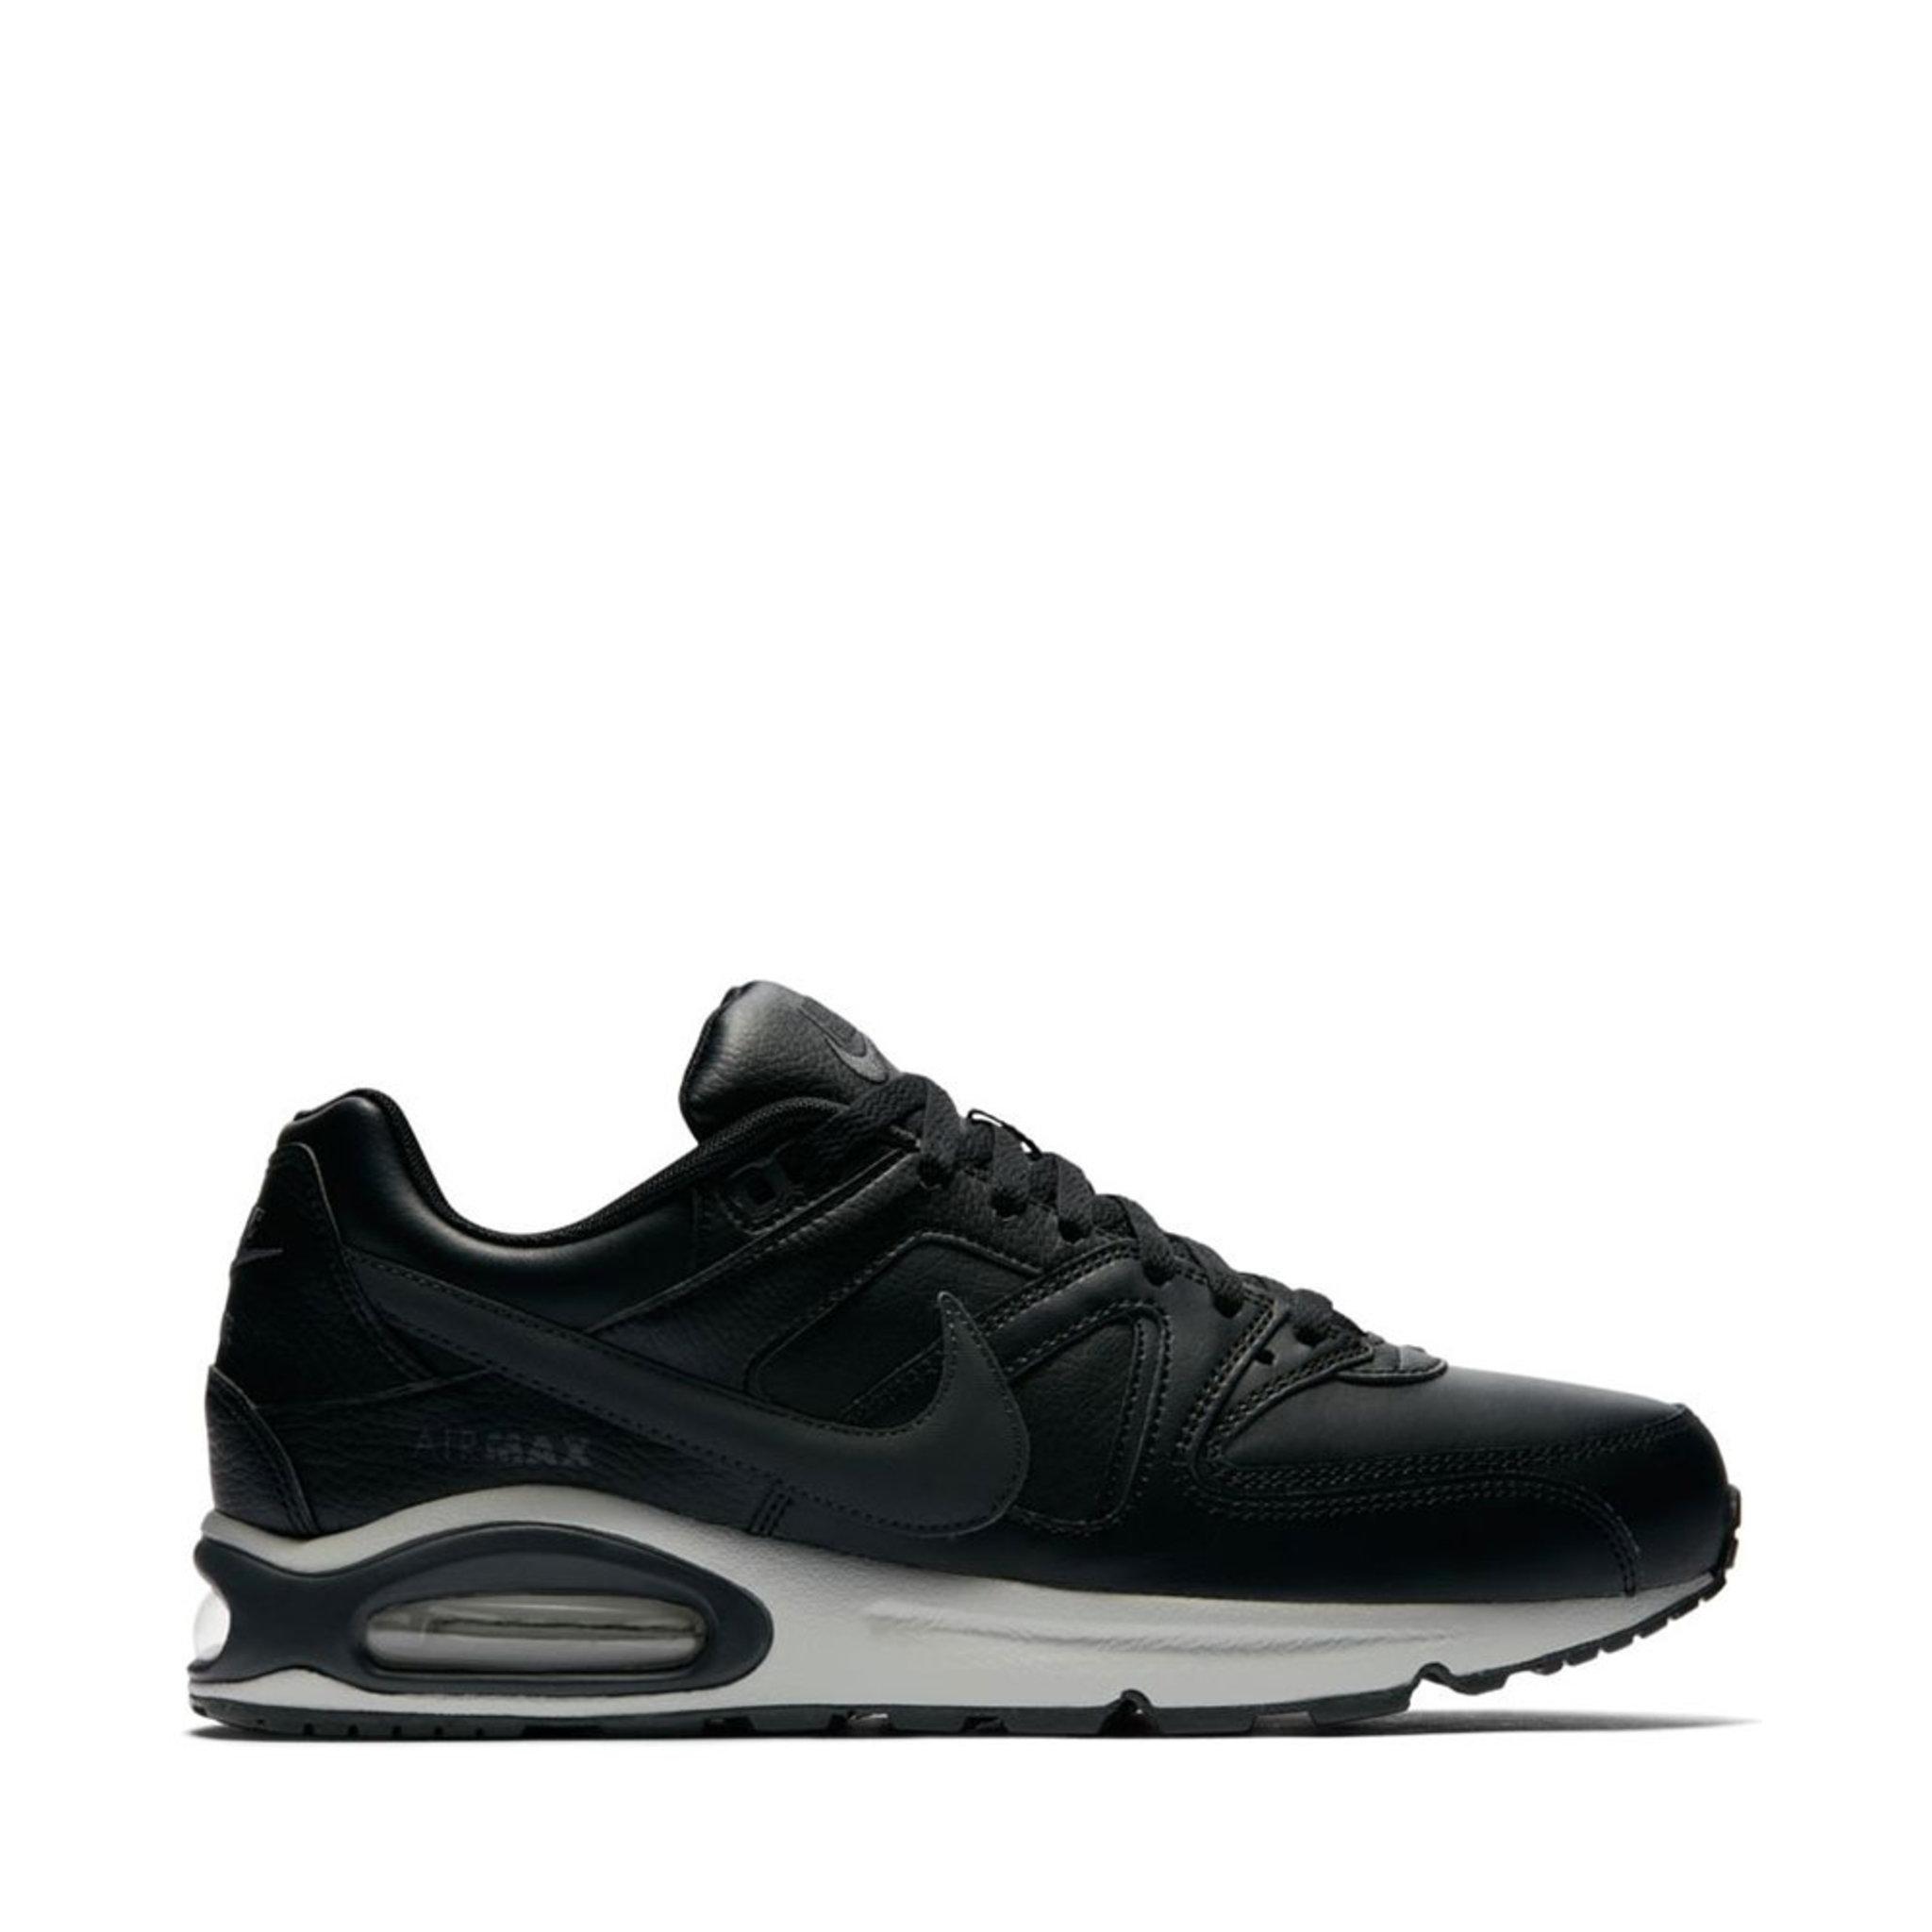 low priced 61128 6566f Air Max Command Leather - Sneakers - Köp online på åhlens.se!